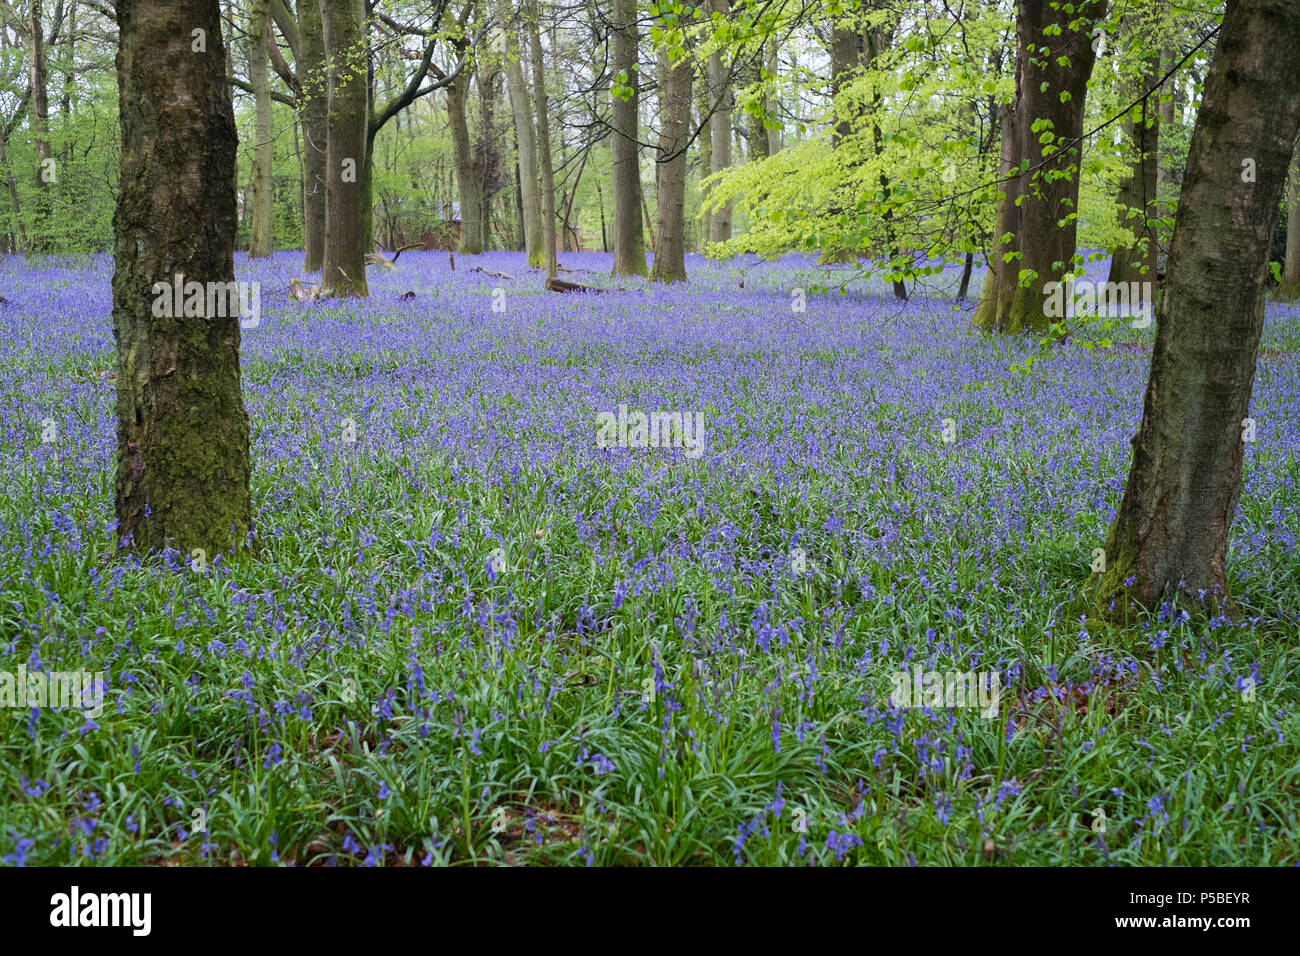 Bluebell flowers Hyacinthoides in woodland, Medstead, Hampshire, England, United Kingdom. - Stock Image